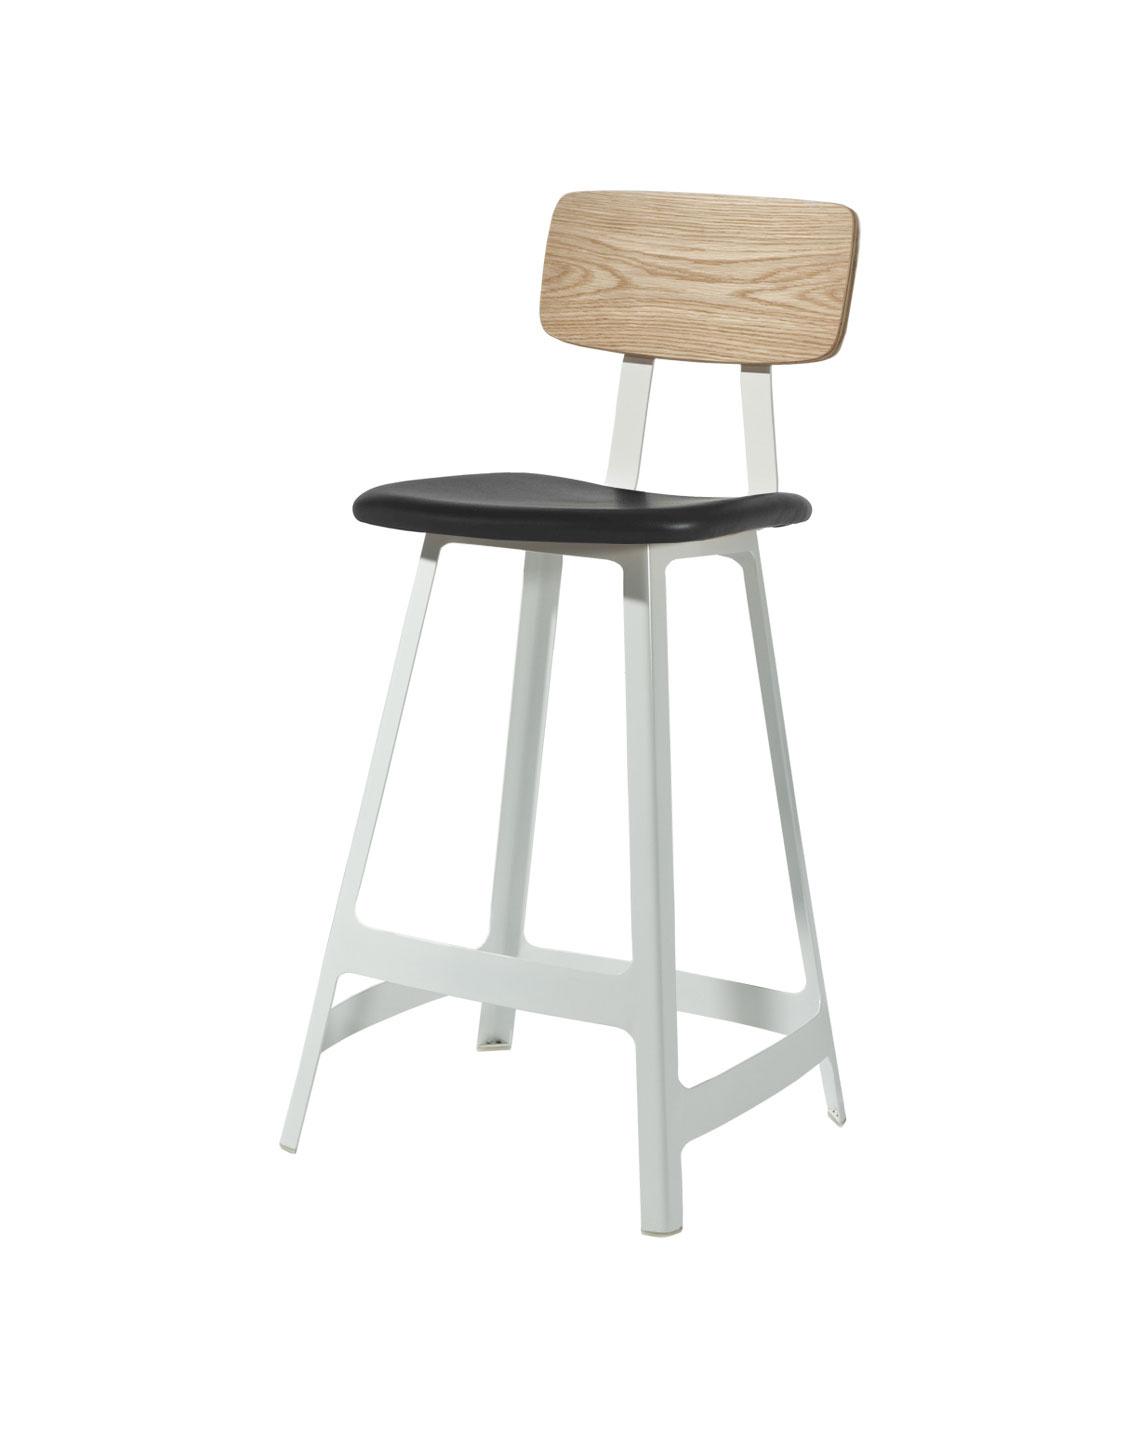 Brilliant Yardbird Sd9140Eus Counter Stool Cape Furniture Unemploymentrelief Wooden Chair Designs For Living Room Unemploymentrelieforg